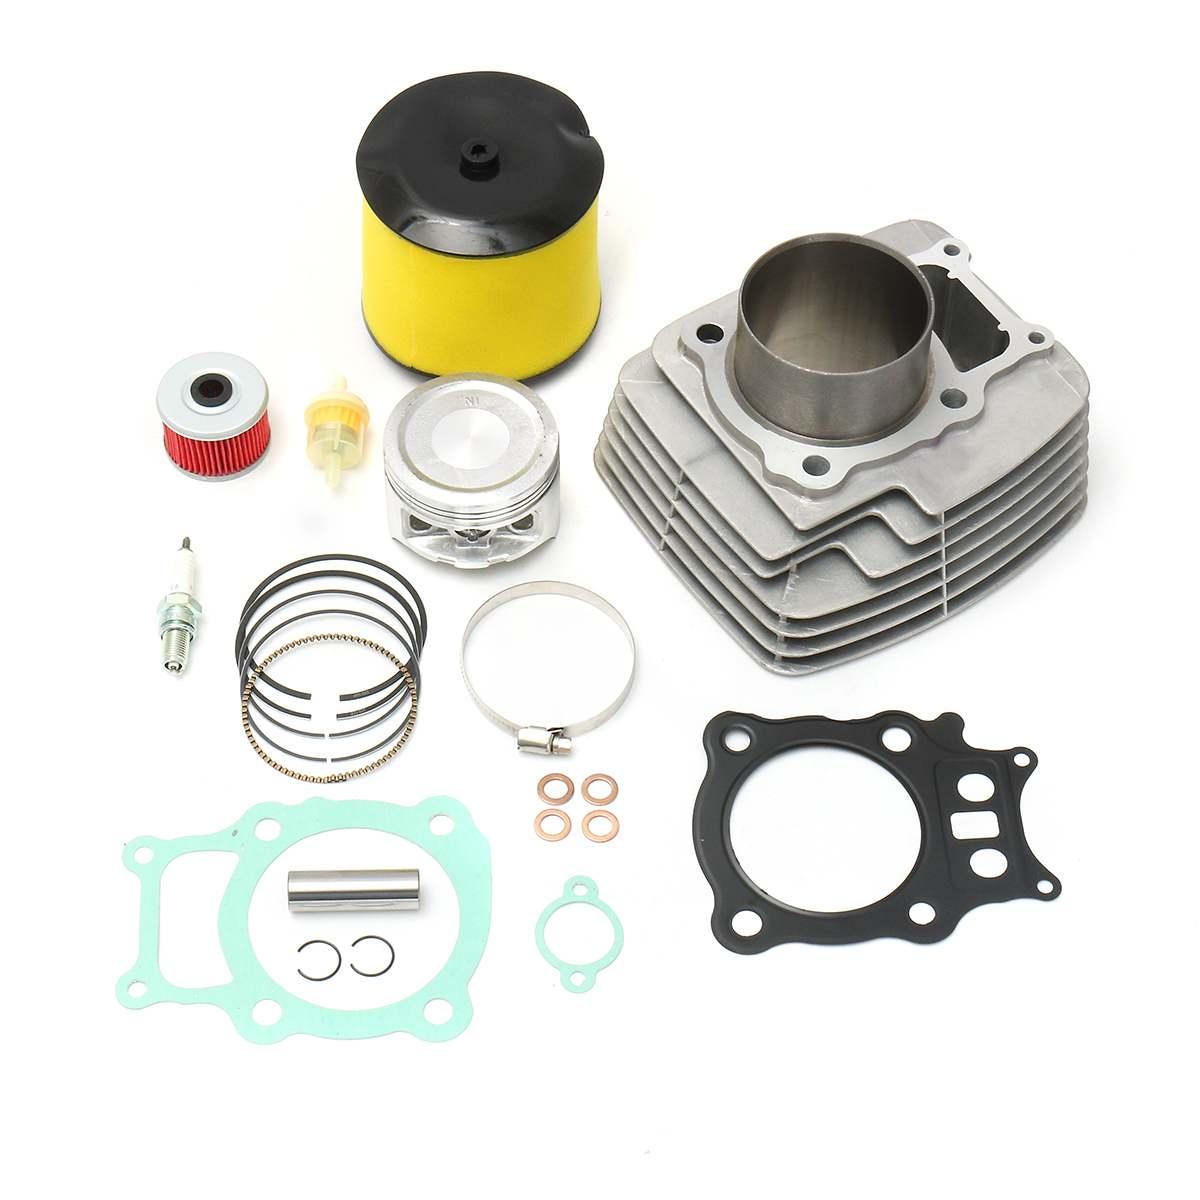 1 Set Cylinder Piston For Spark Plugs Filter Gasket Rings For Honda Rancher TRX350 For TRX 350 2000-2006 12100-HN5-670